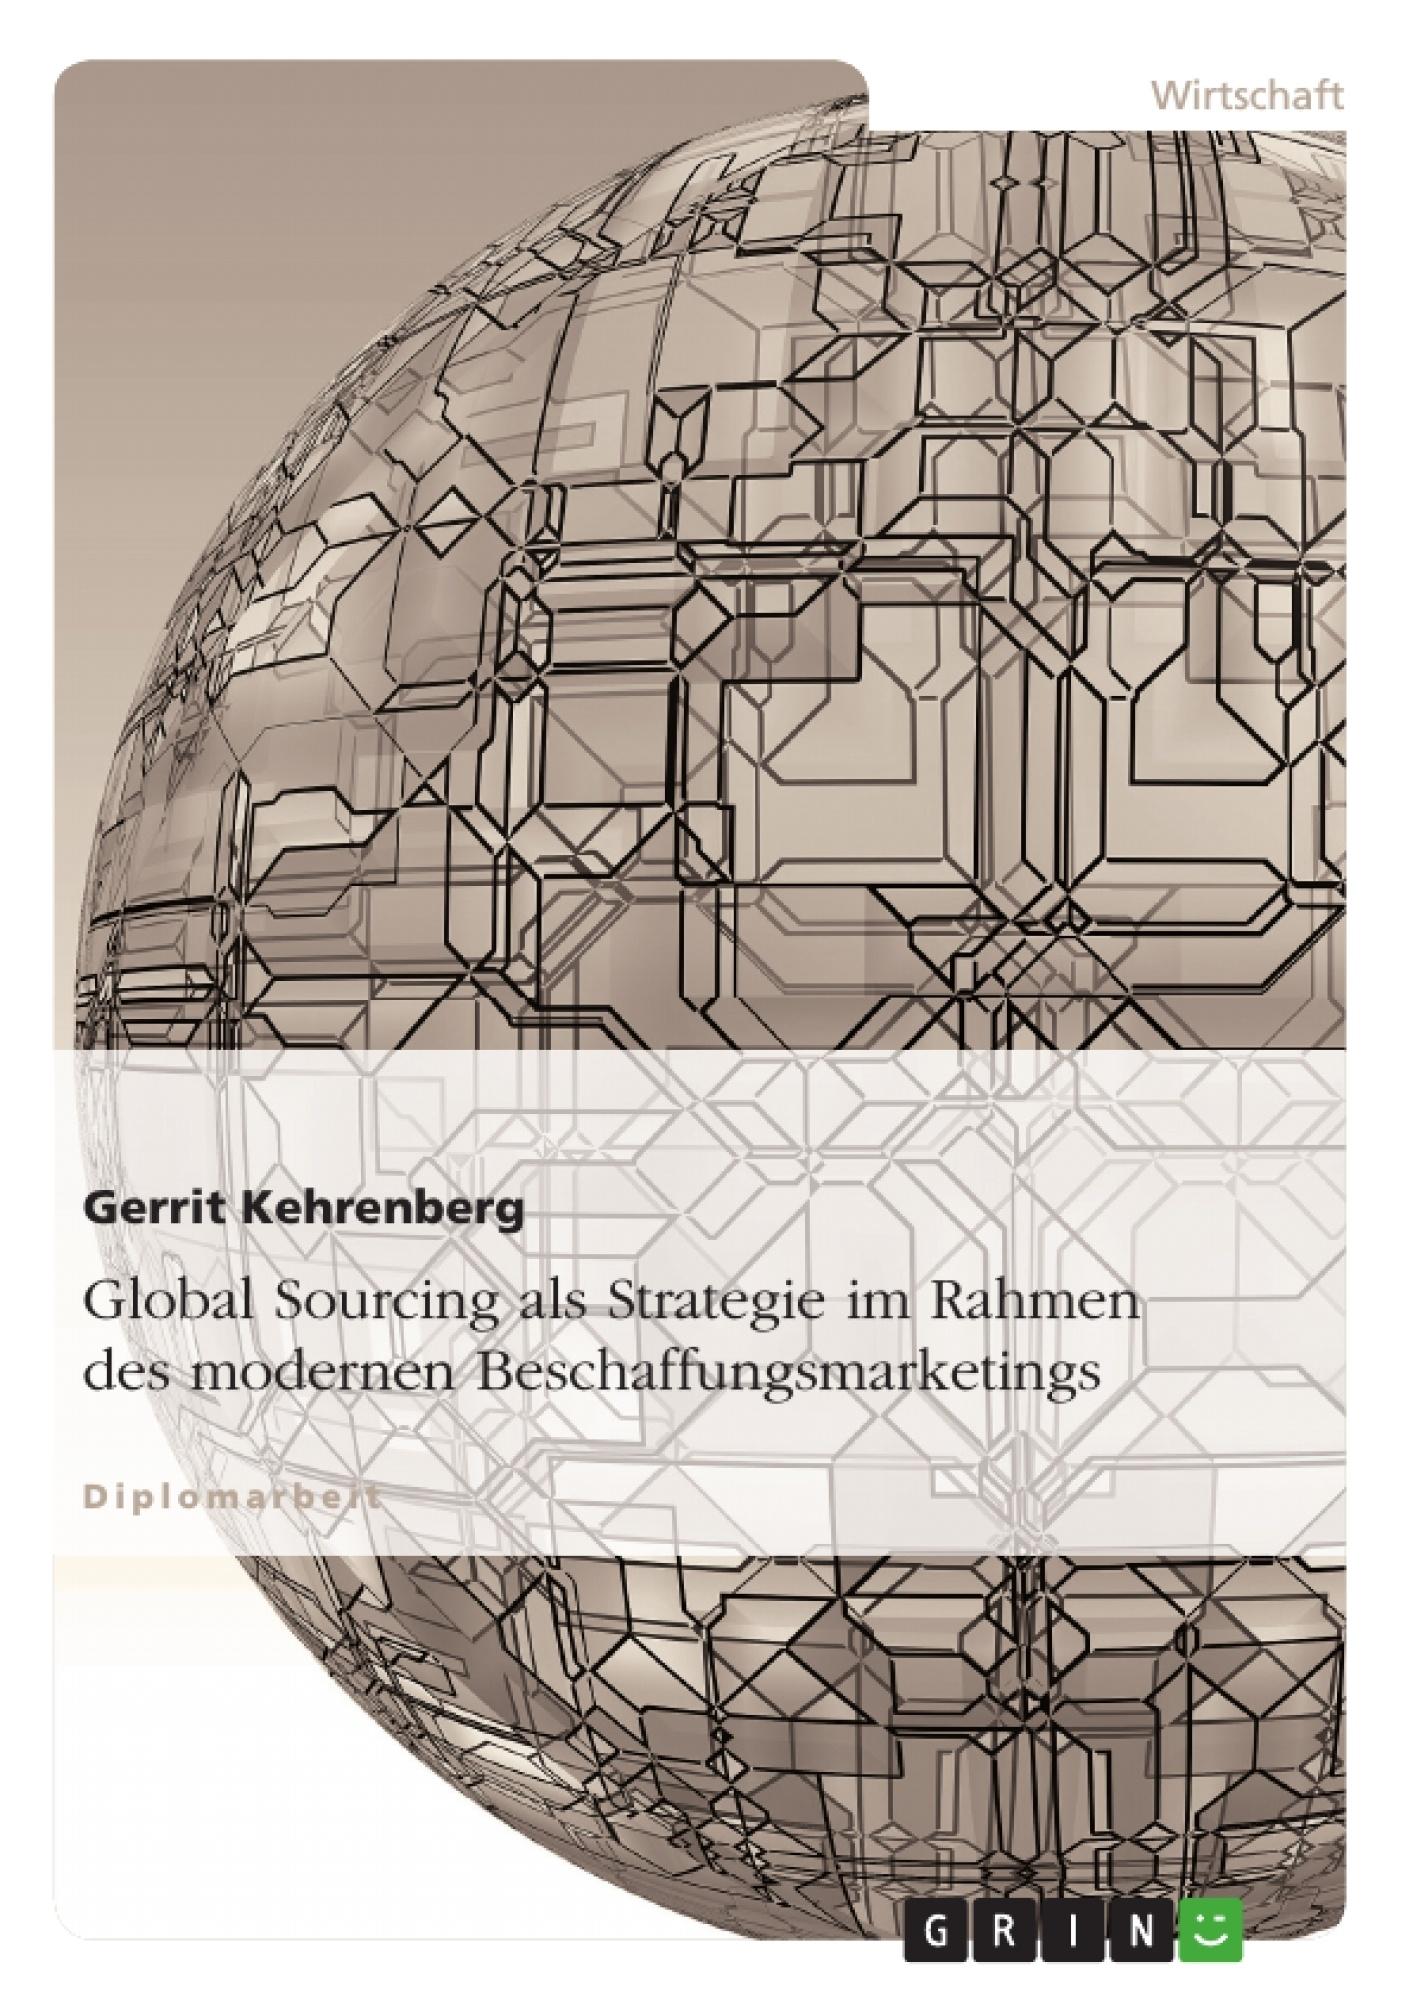 Titel: Global Sourcing als Strategie im Rahmen des modernen Beschaffungsmarketings